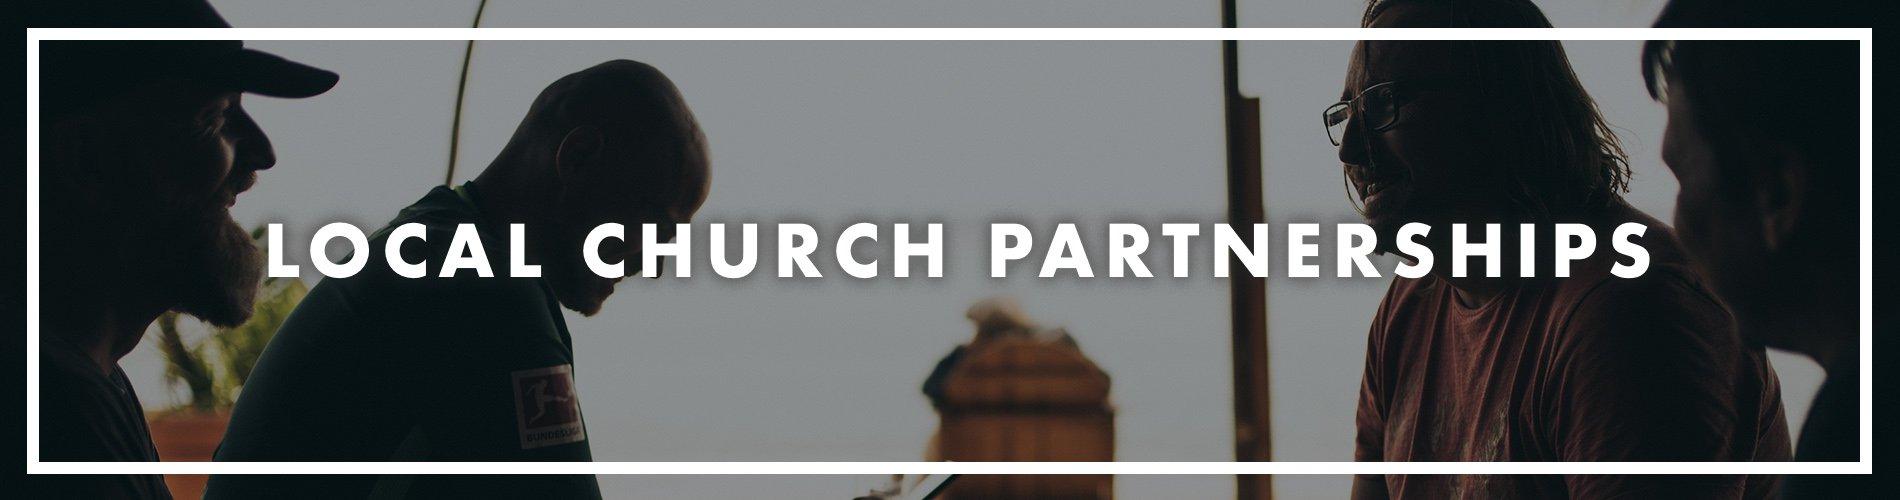 Local Church Partnerships banner